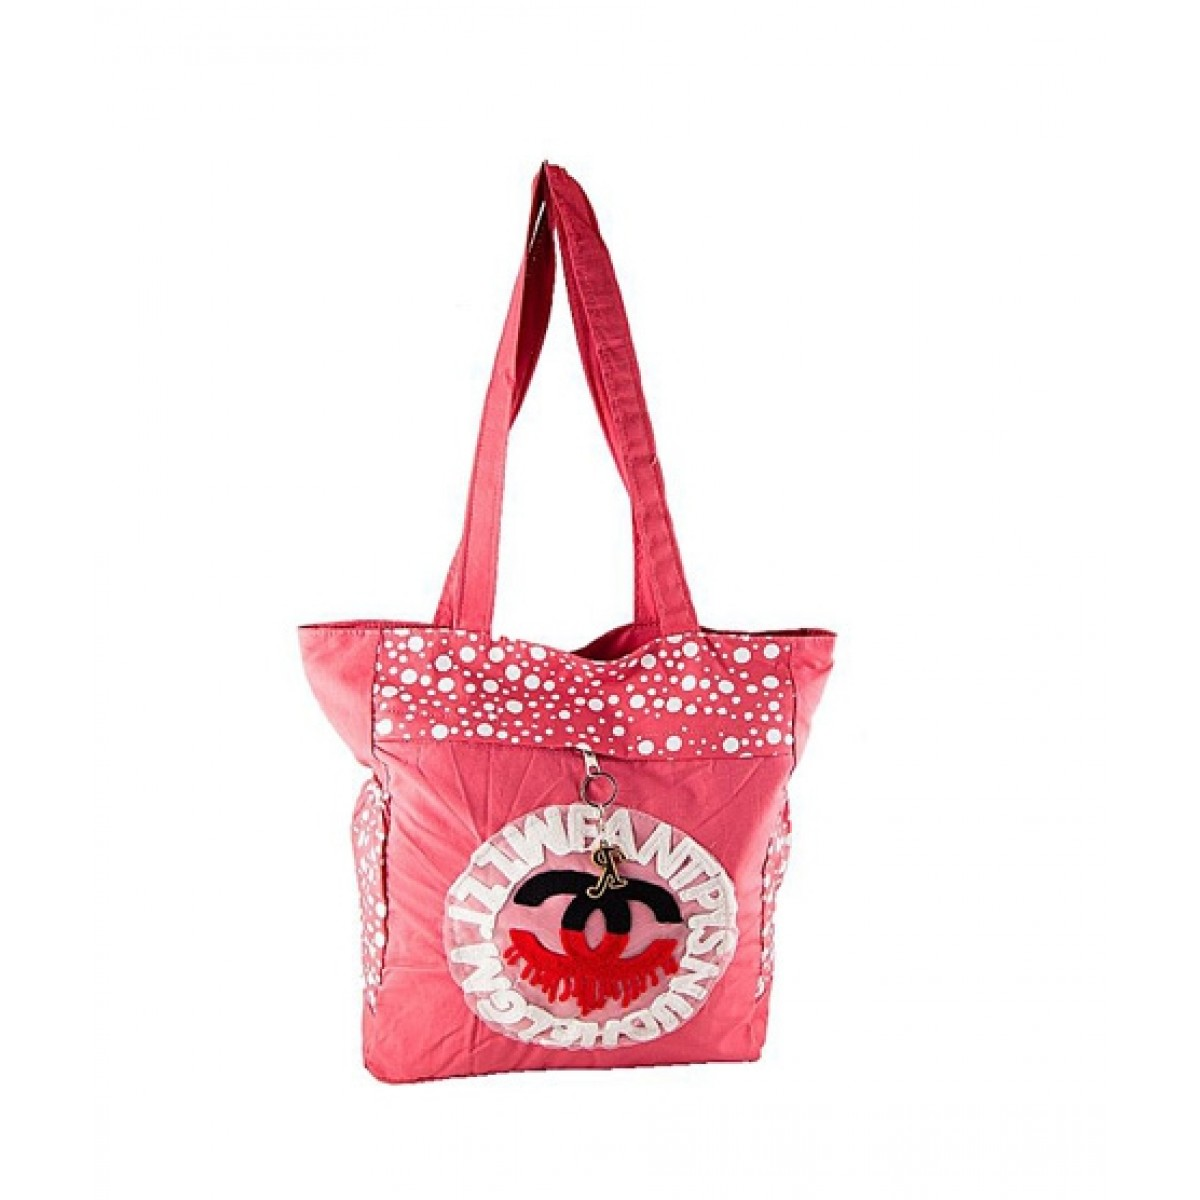 Asaan Buy Light Leather School Handbag Pink